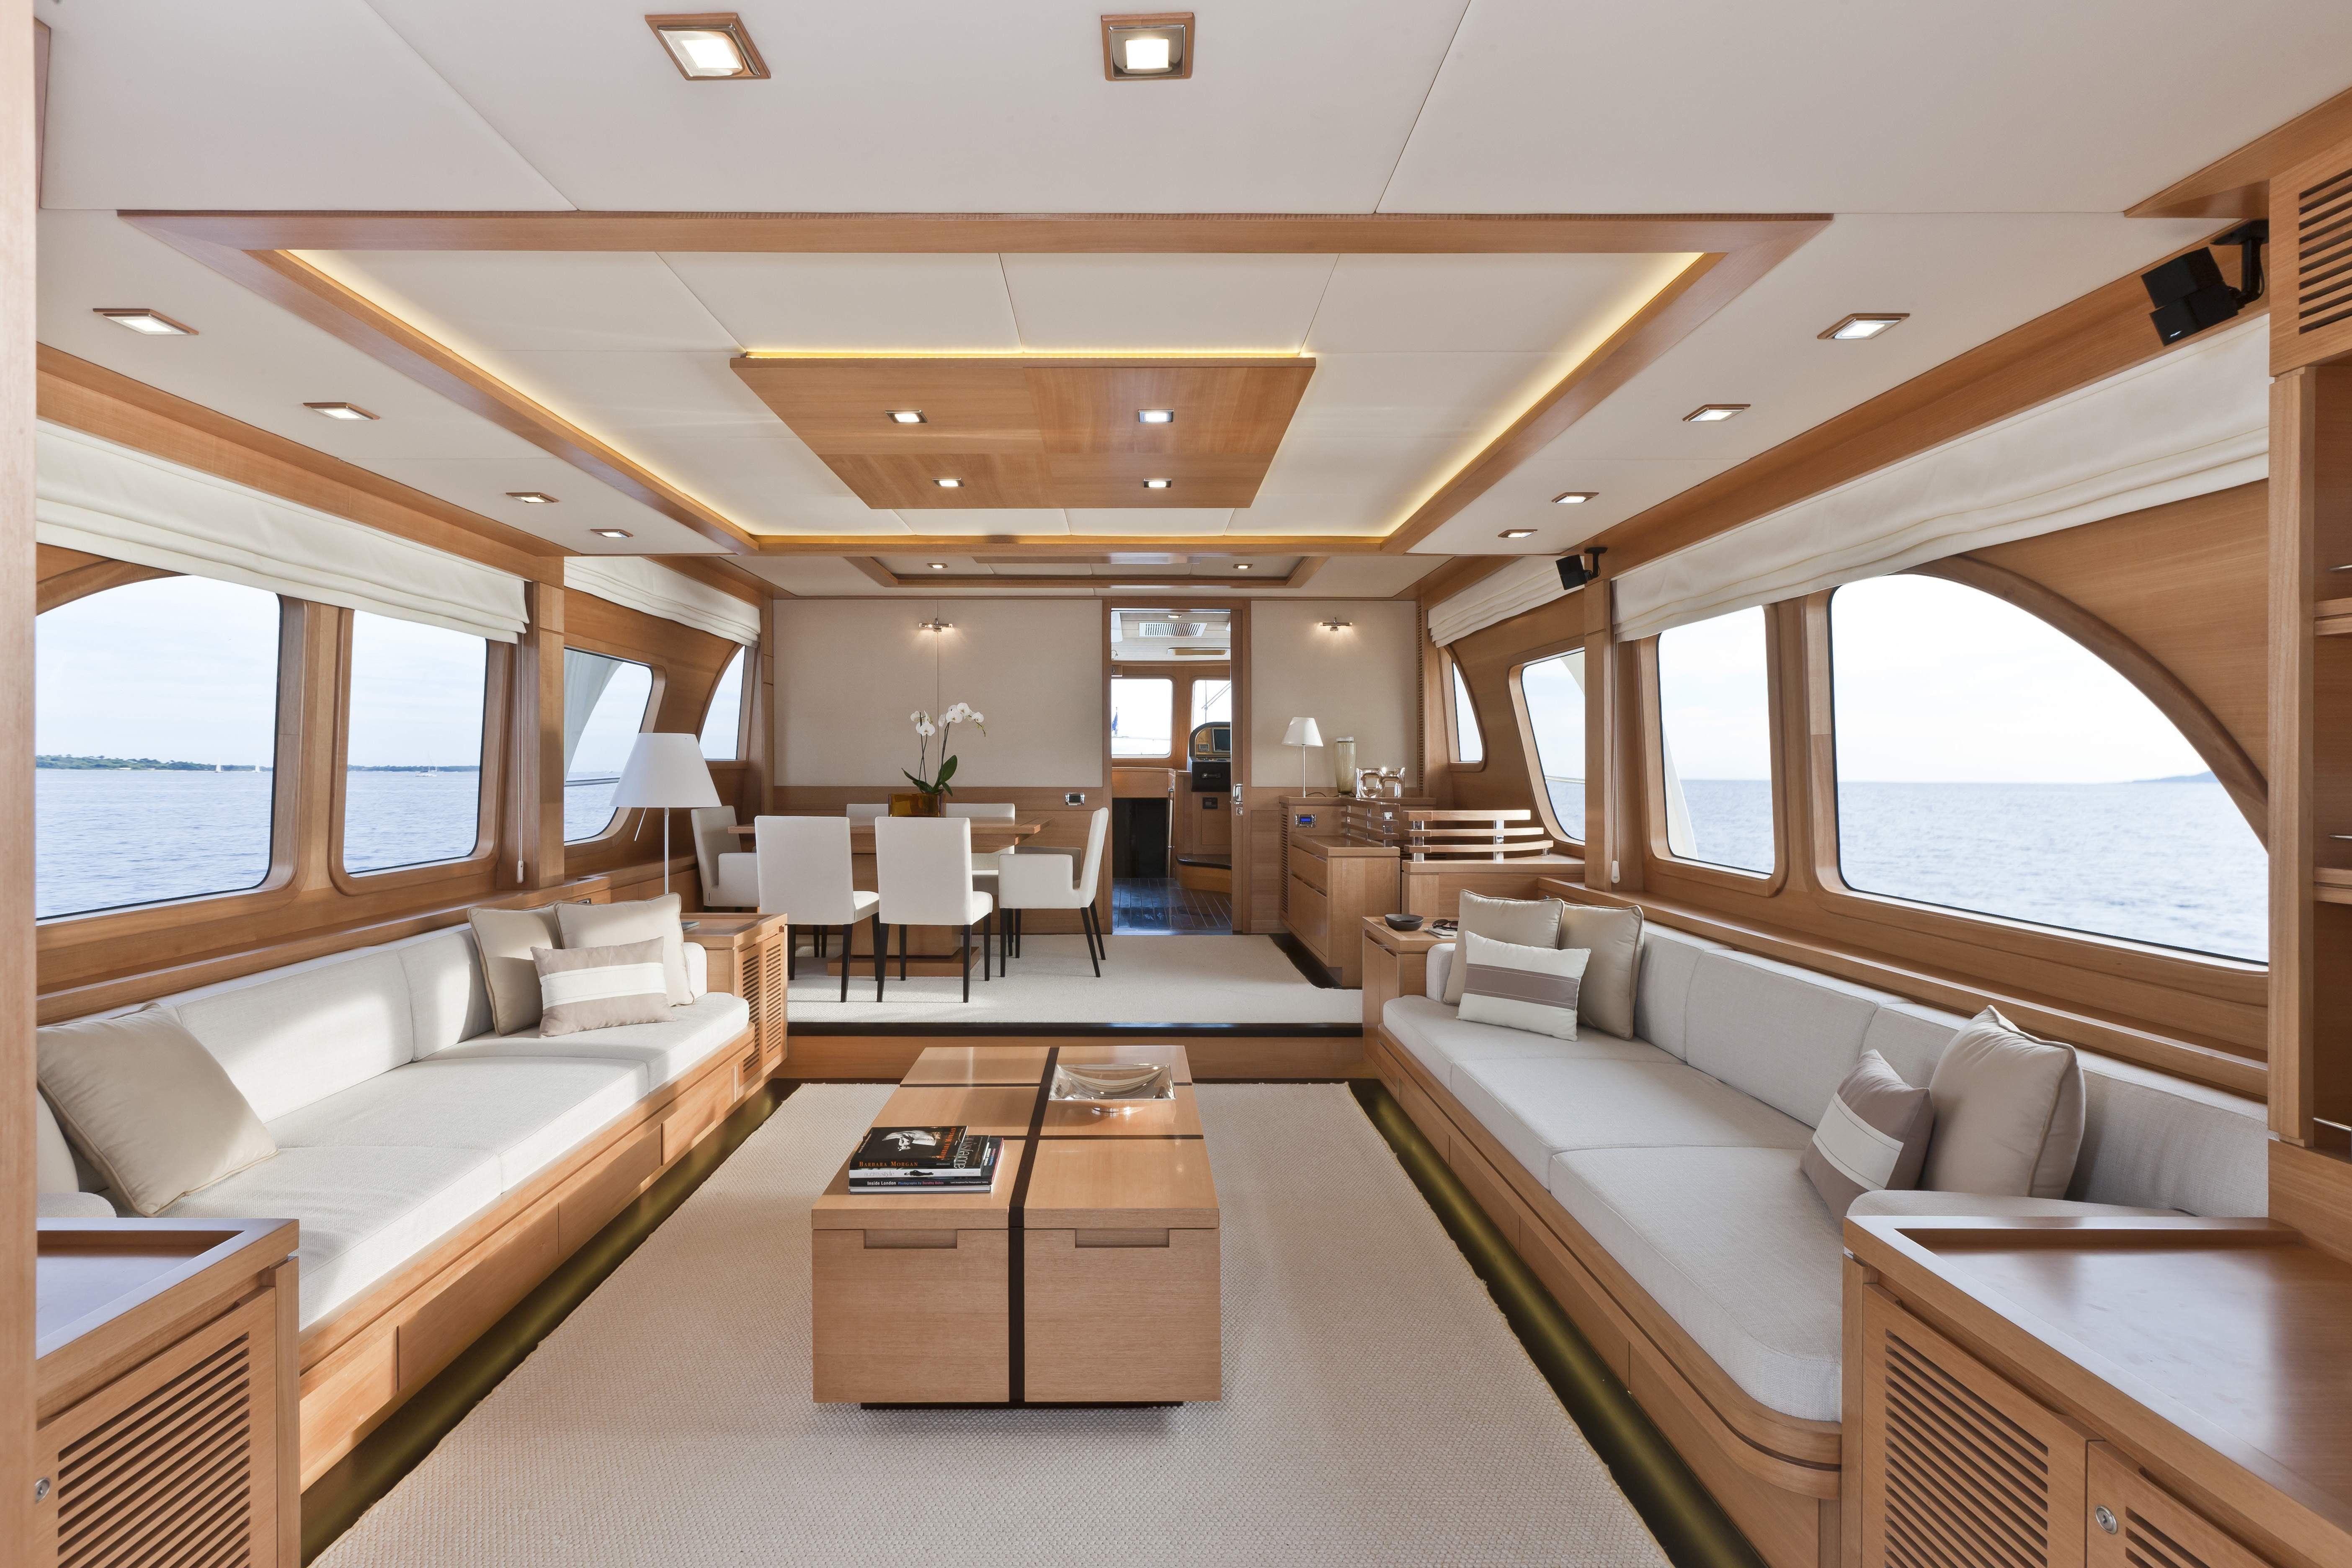 Boat interiors boat interior decorating ideas image source pinterest com